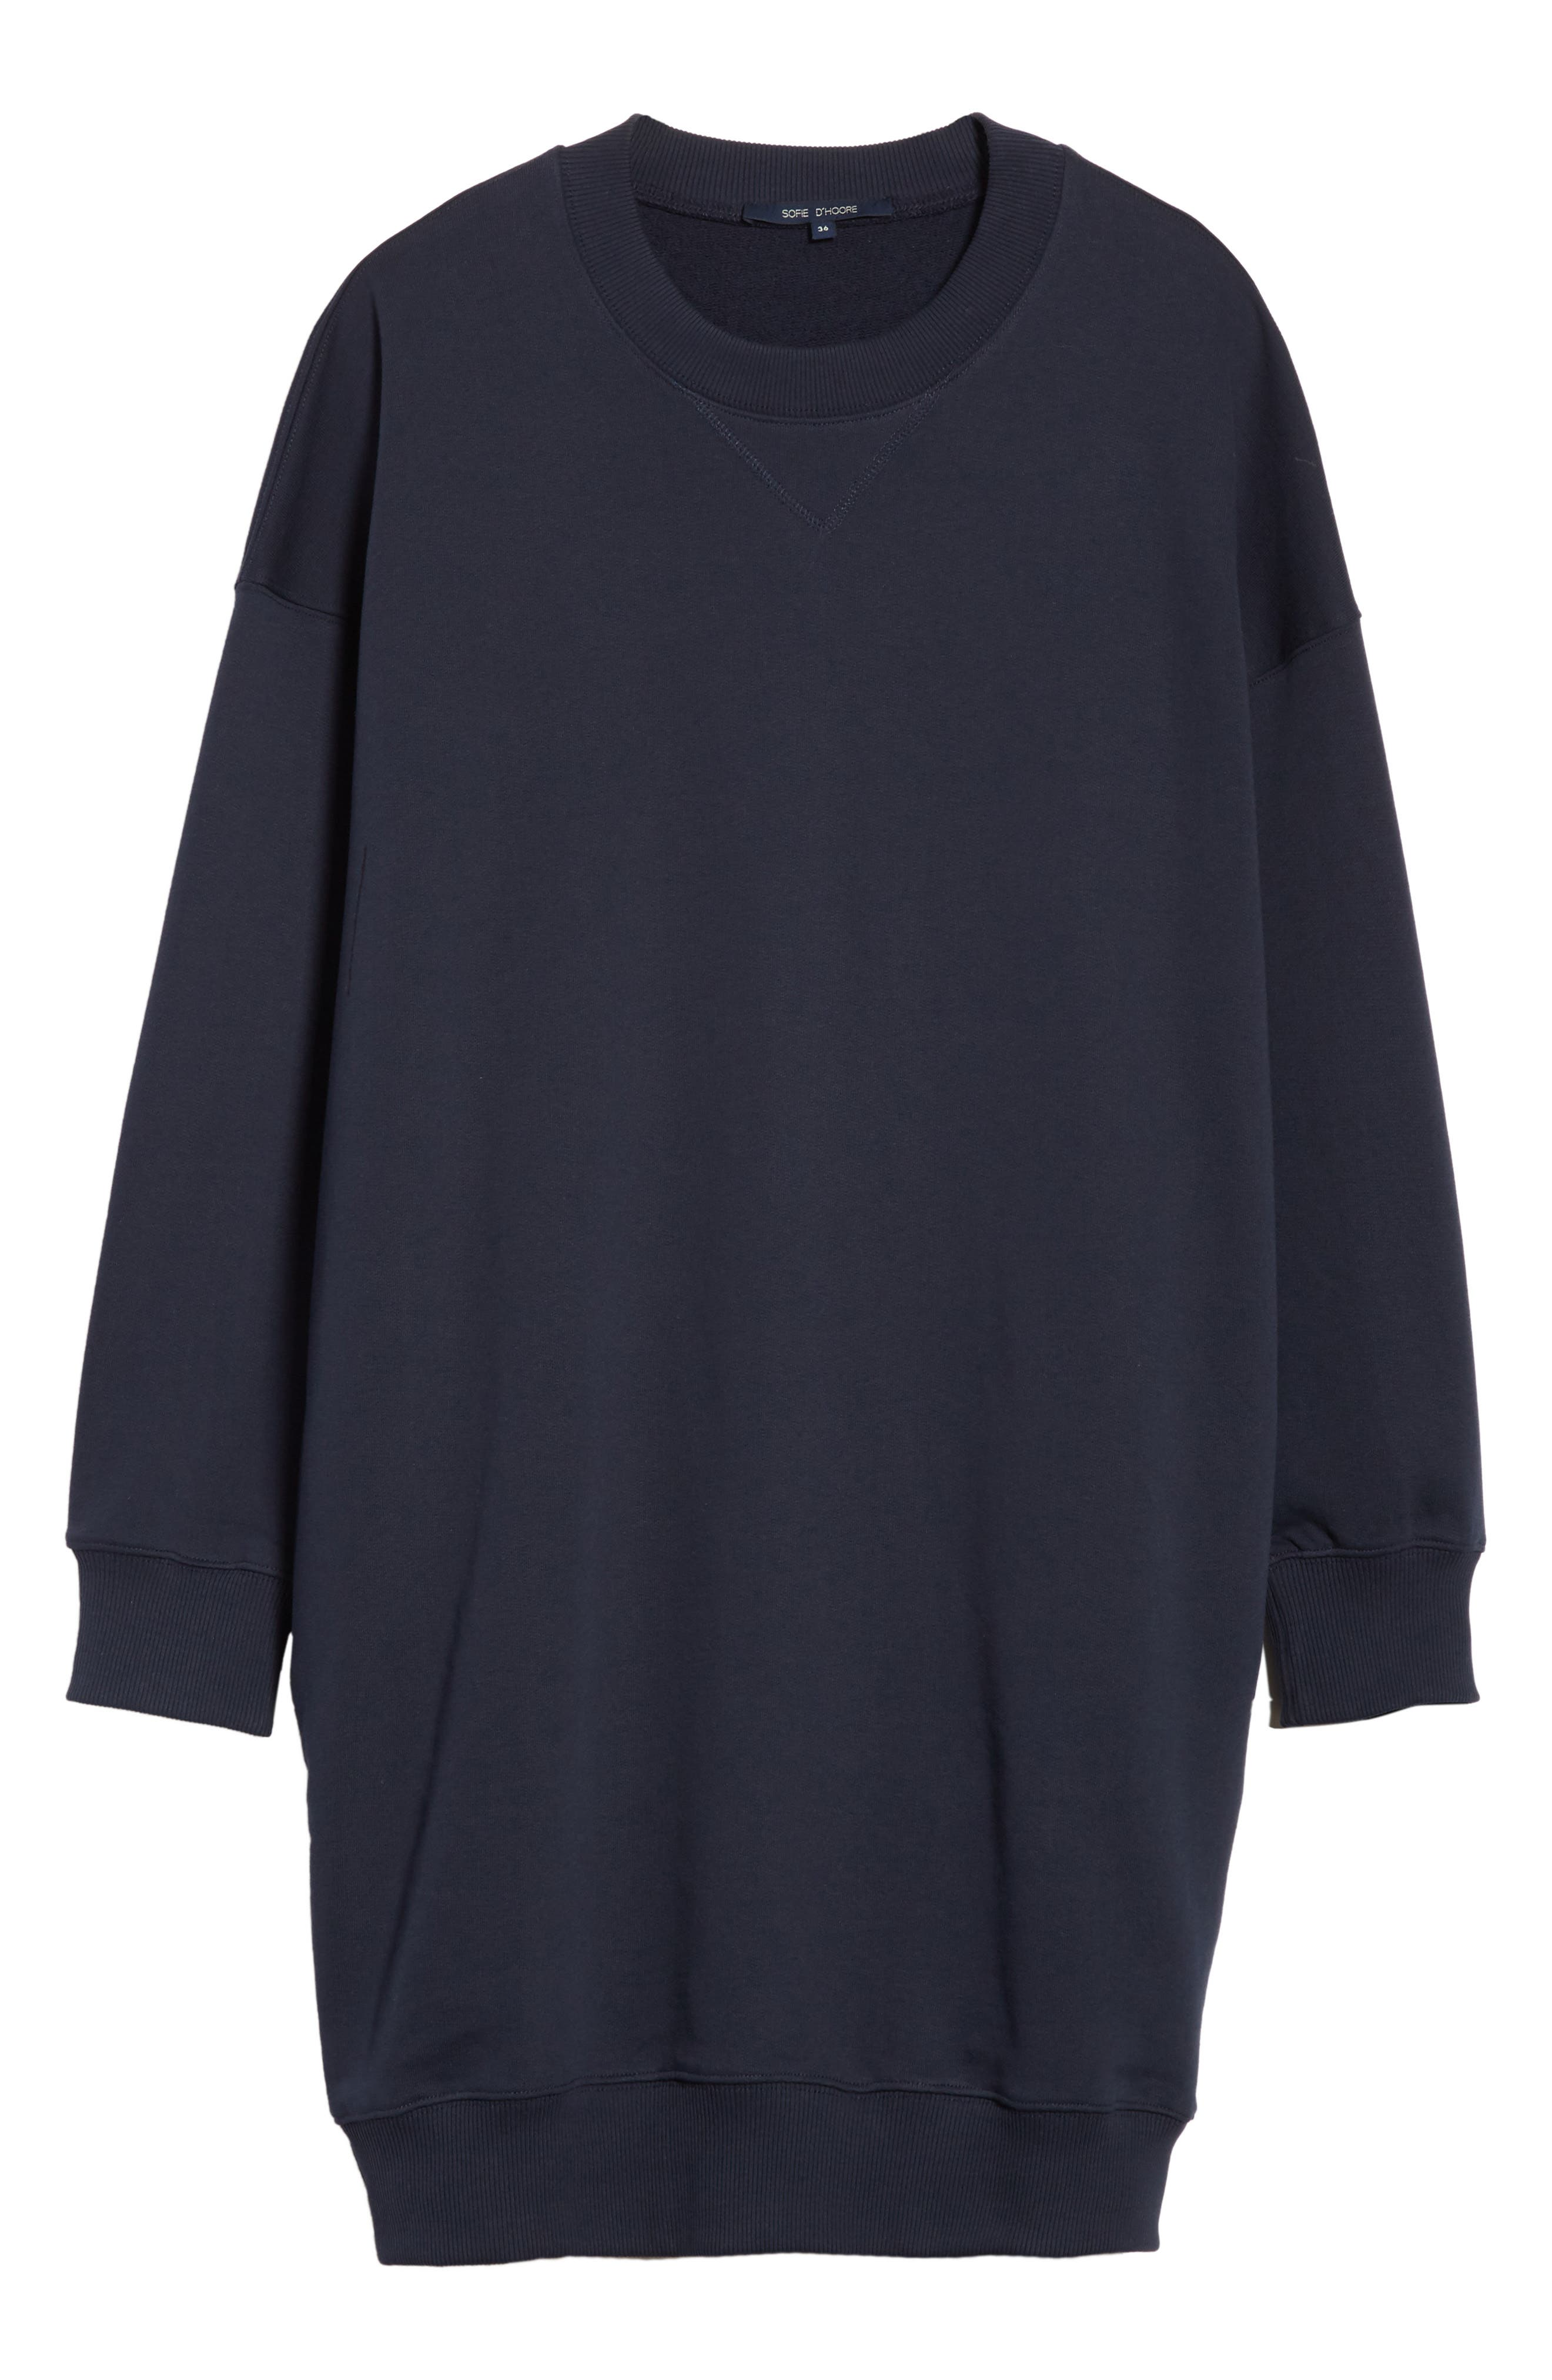 Sweatshirt Dress,                             Alternate thumbnail 6, color,                             410